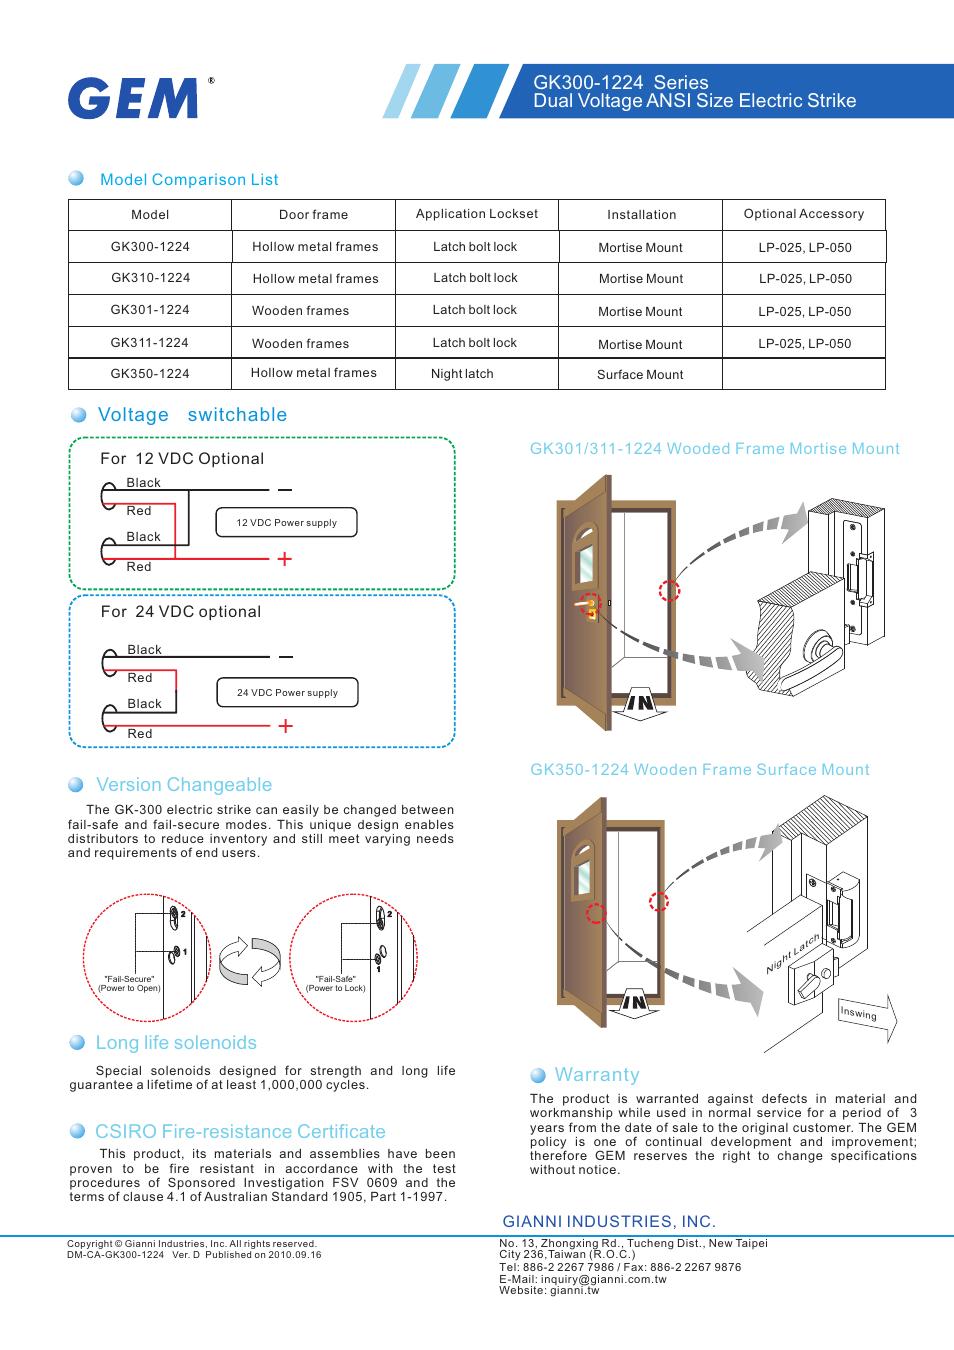 2 warranty csiro fire resistance certificate long life rh manualsdir com Manuals in PDF User Guide